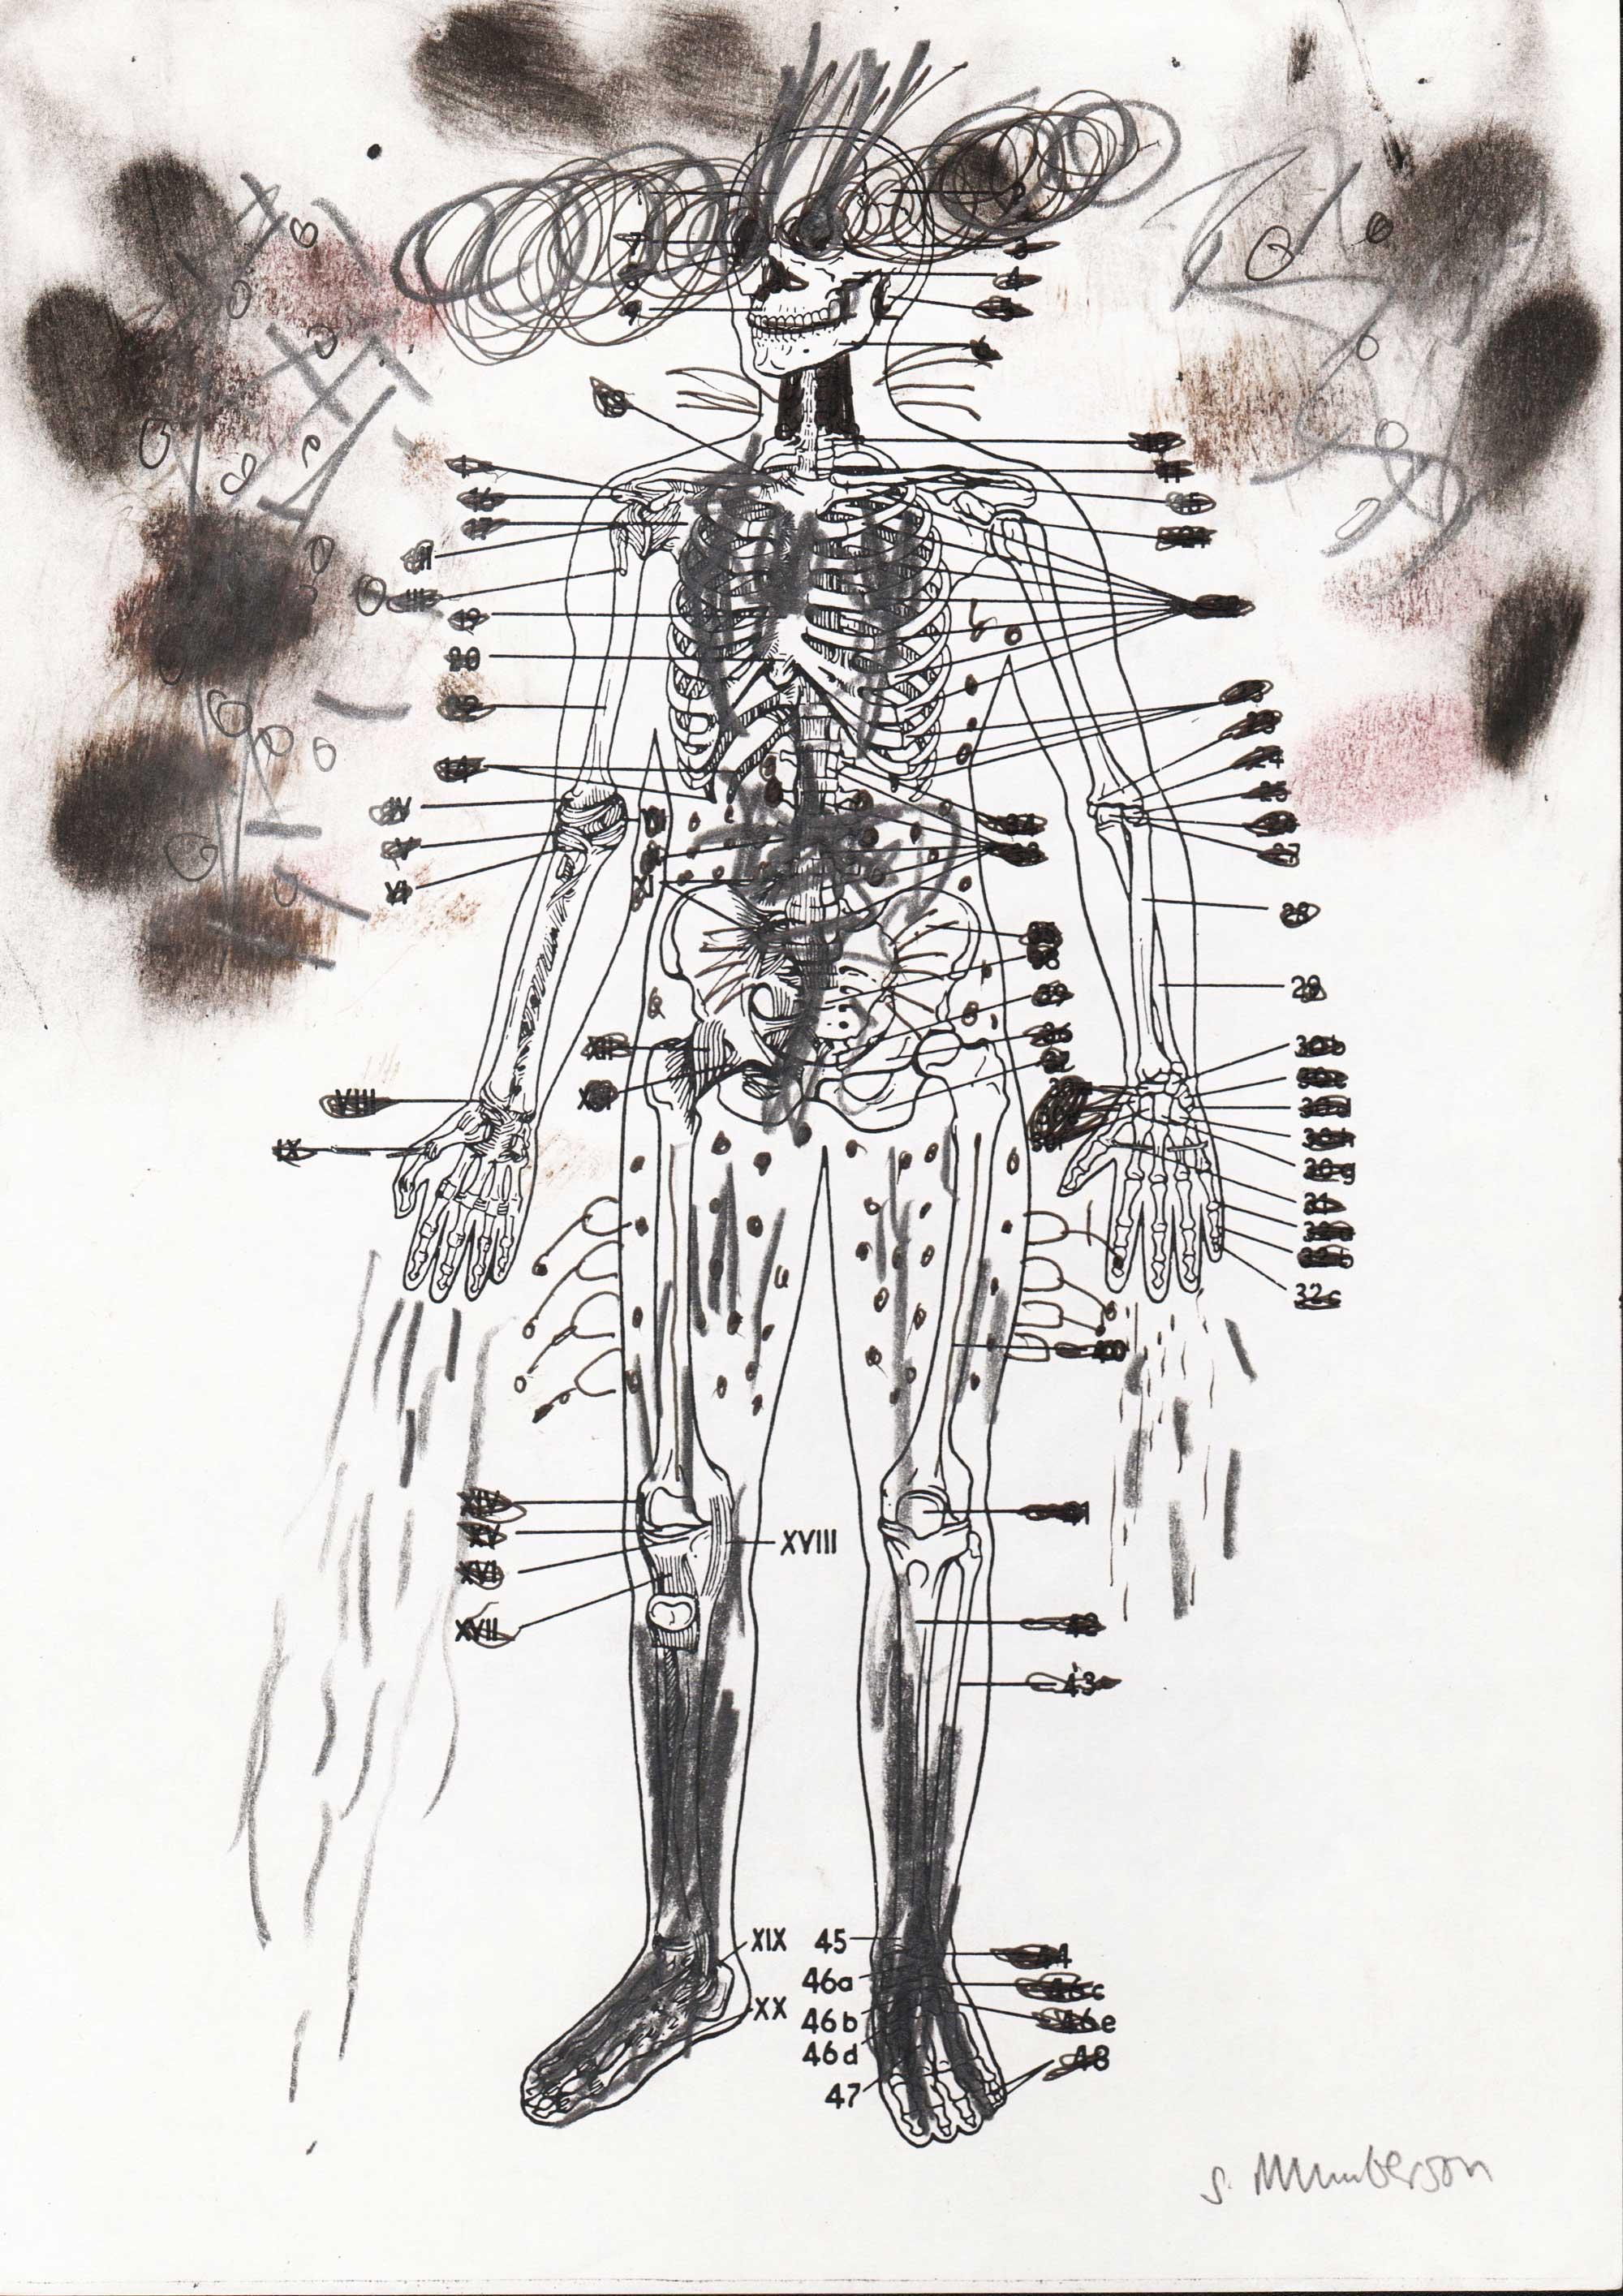 Stephen MUMBERSON (1955) UK, New Human 5, 2014, Pencil, 20,5 x 21 cm